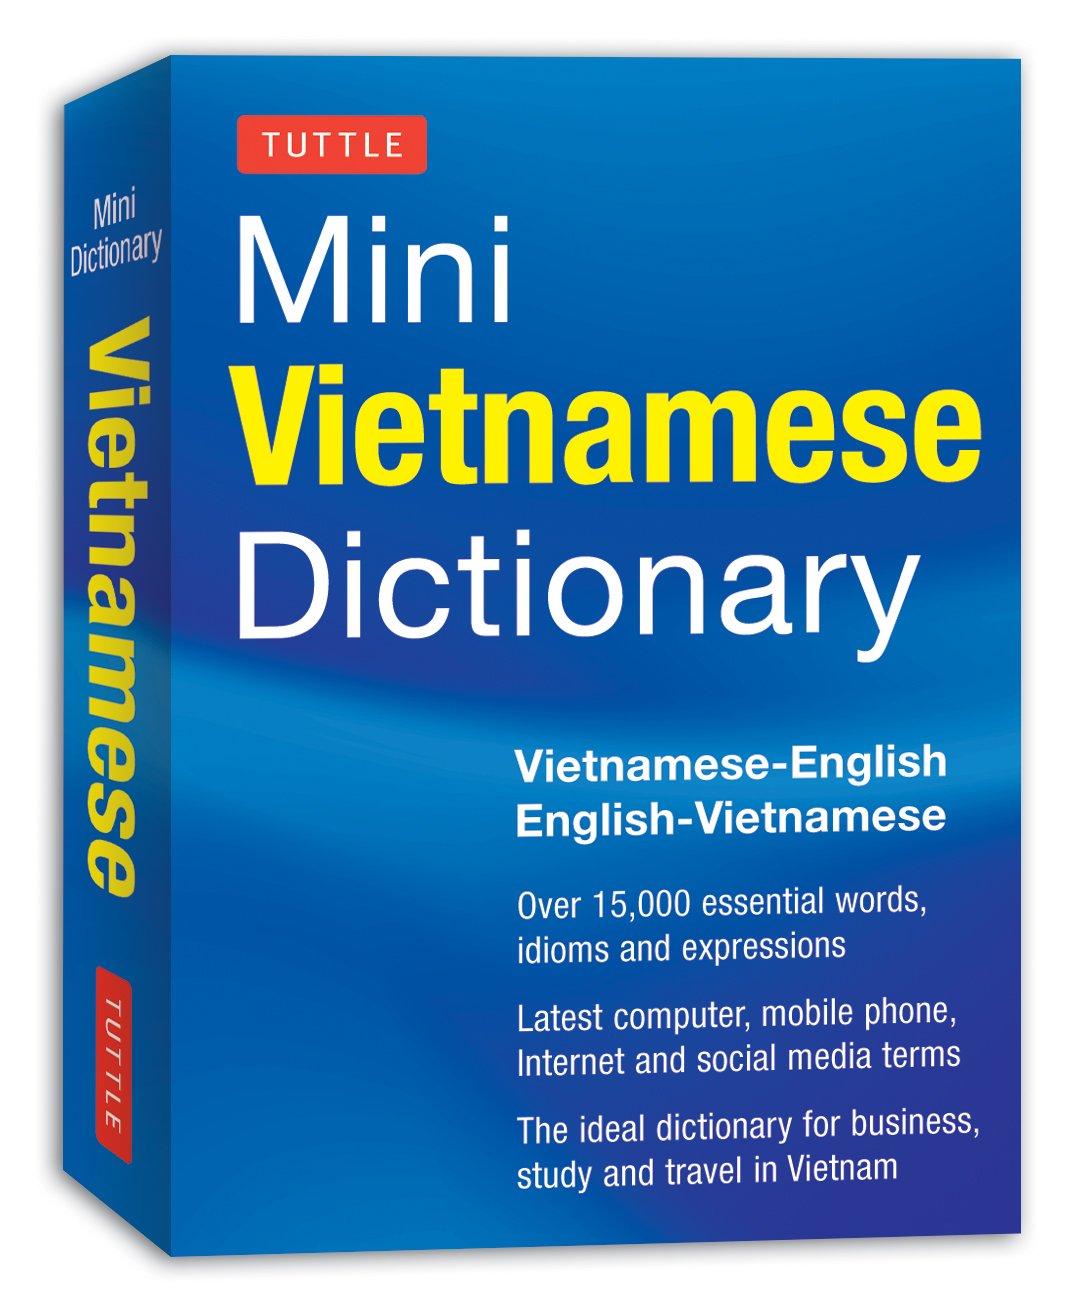 Amazon.com: Tuttle Mini Vietnamese Dictionary: Vietnamese-English/English-Vietnamese  Dictionary (Tuttle Mini Dictionary) (9780804842877): Phan Van Giuong: ...